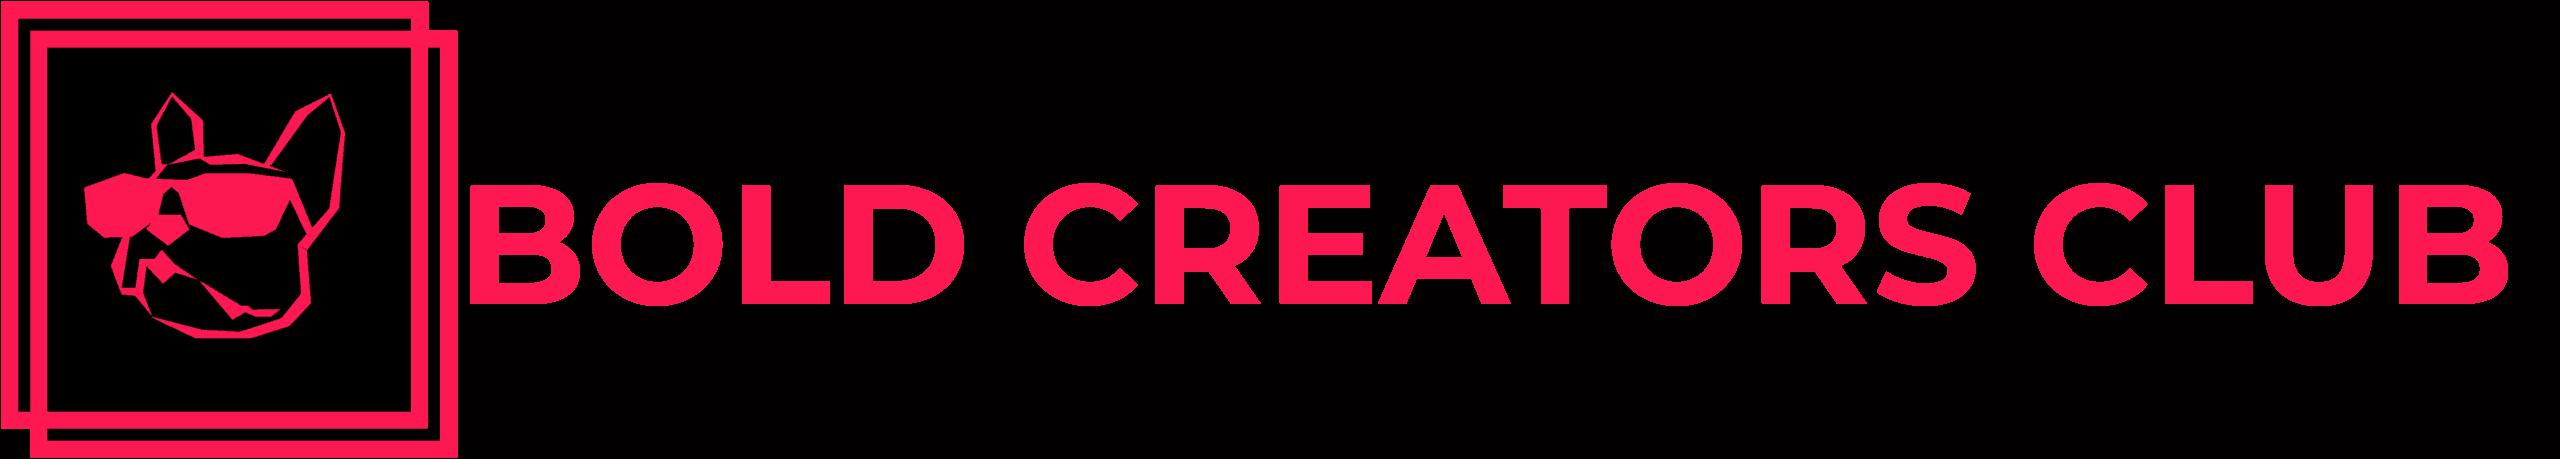 Bold Creators Club Influencer Marketing Agency Brazil South America